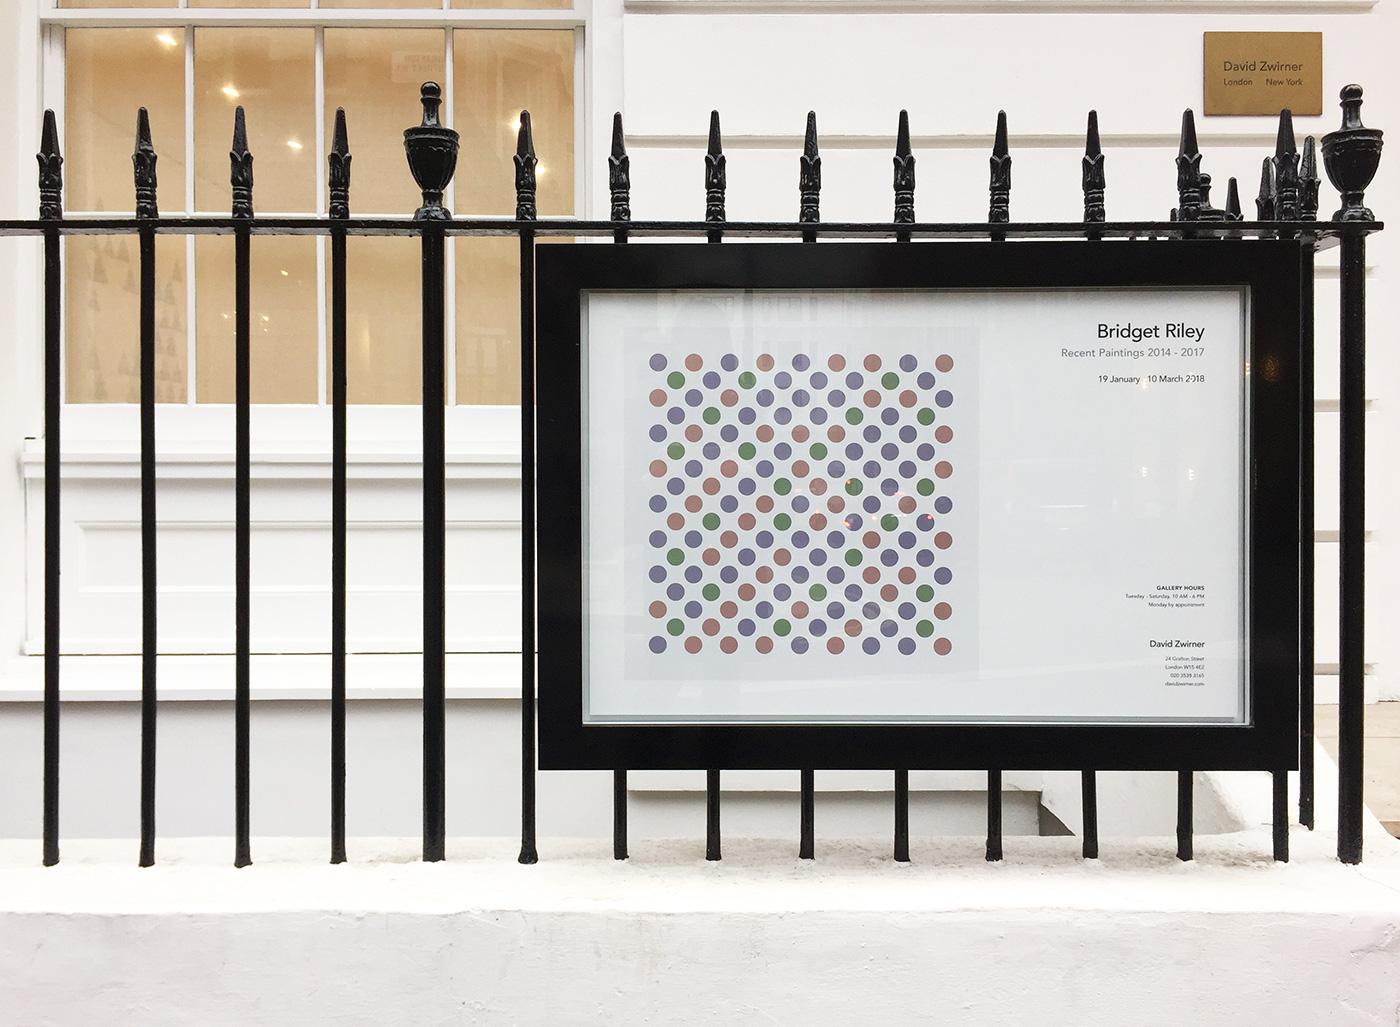 Bridget Riley, David Zwirner London